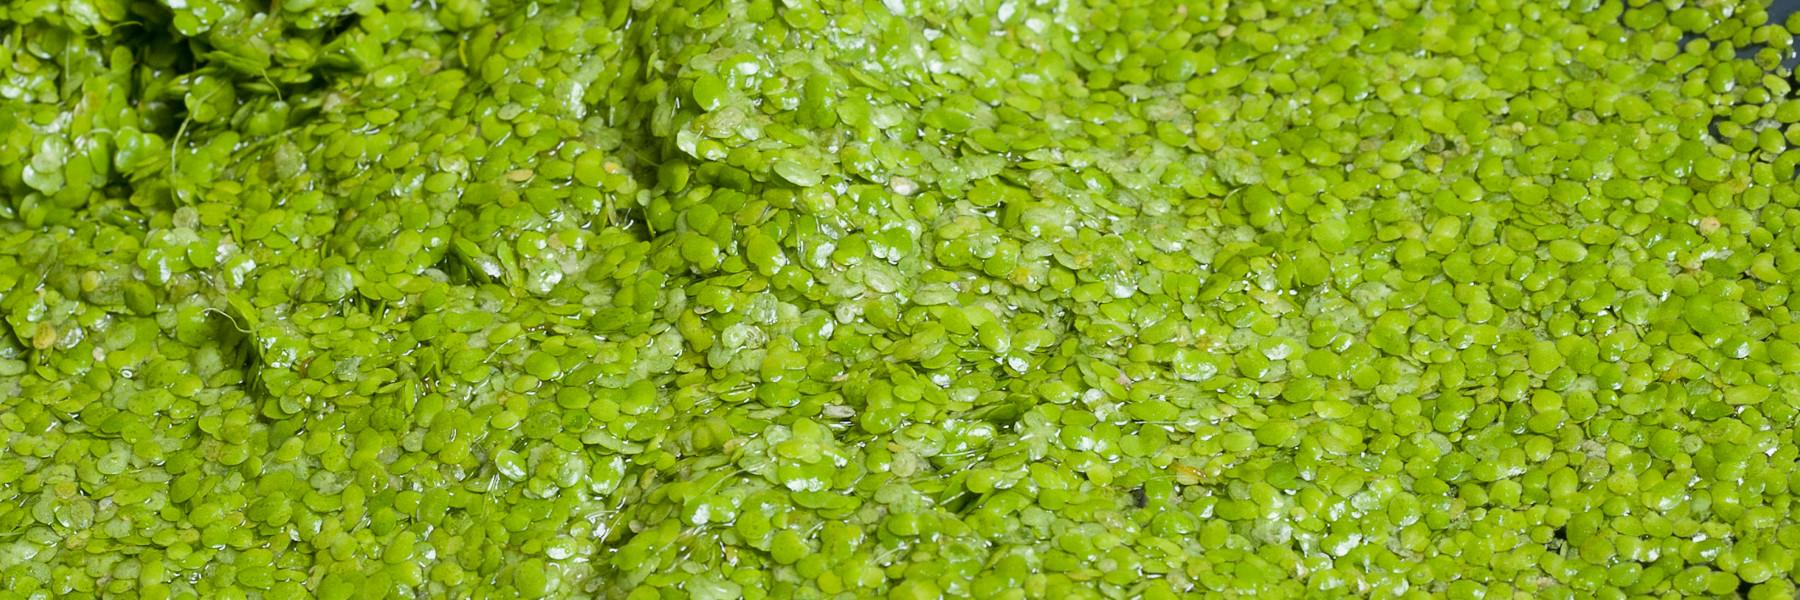 greenhouse protein; resultaten waterlinzen-onderzoek